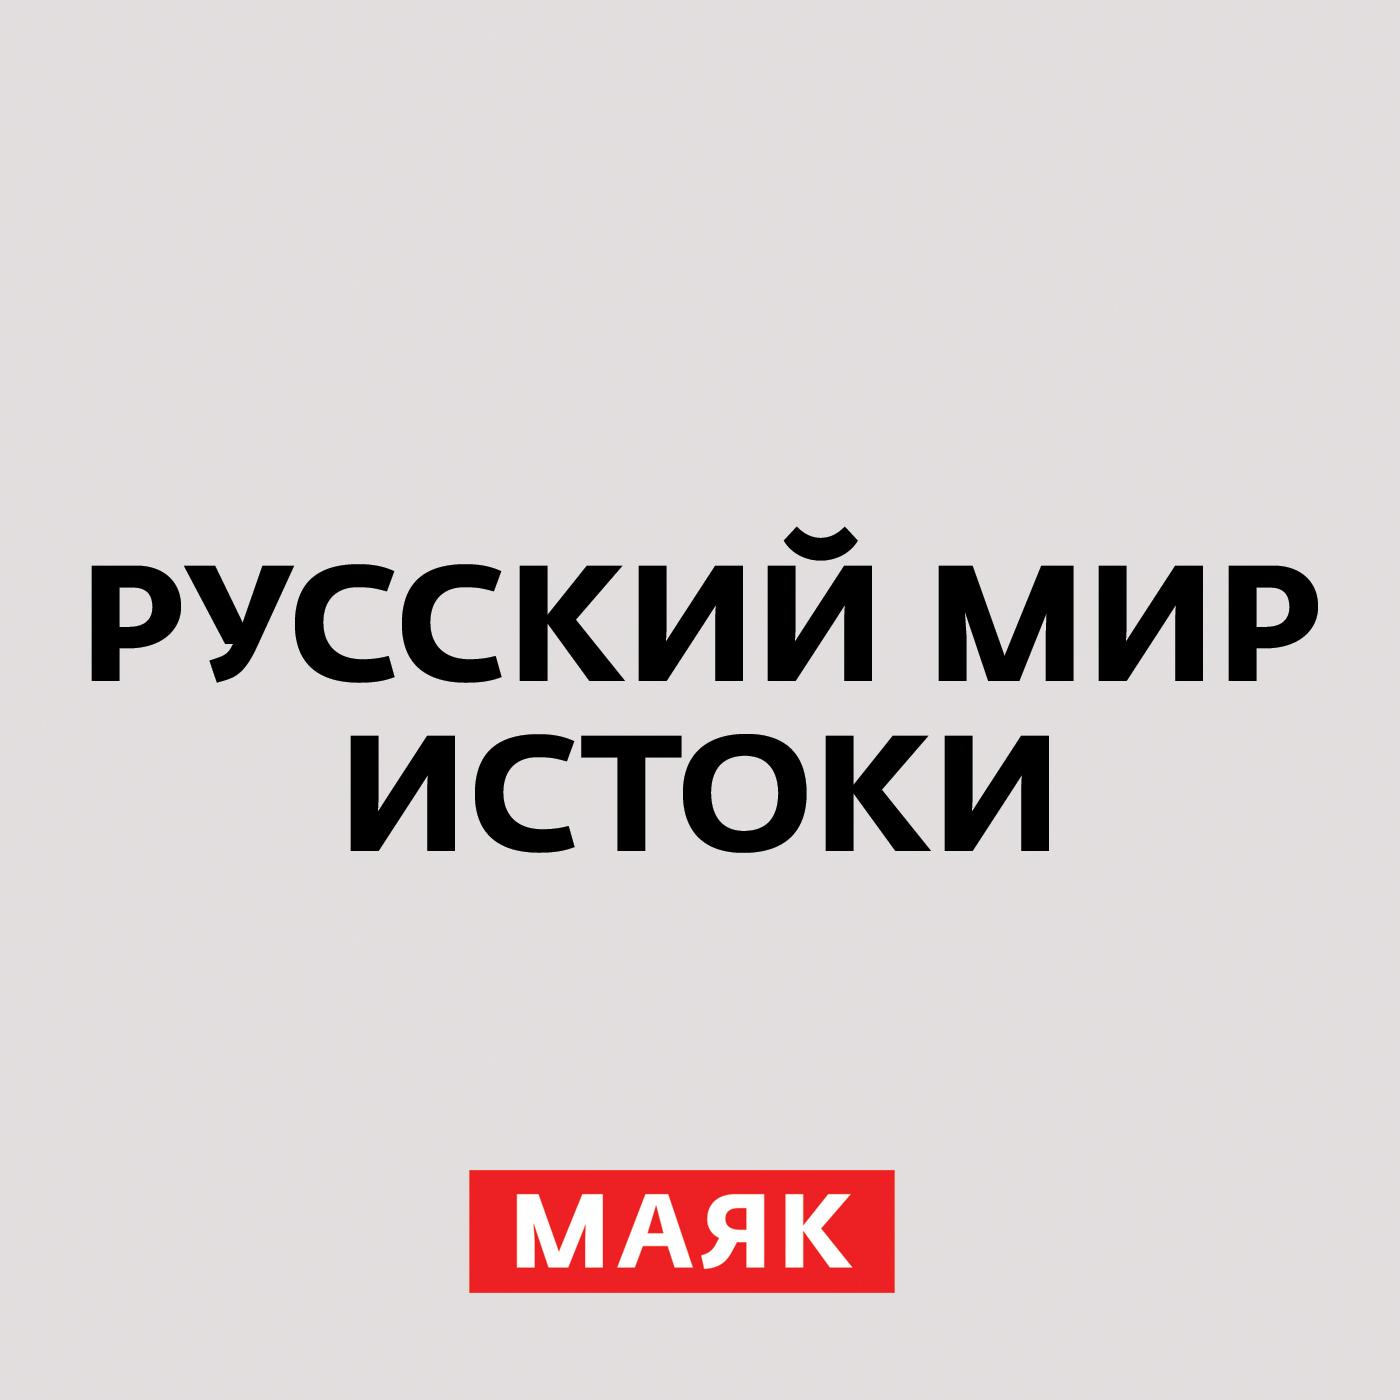 Творческий коллектив радио «Маяк» Борис Годунов и Фёдор I Иоаннович (продолжение) творческий коллектив радио маяк теща